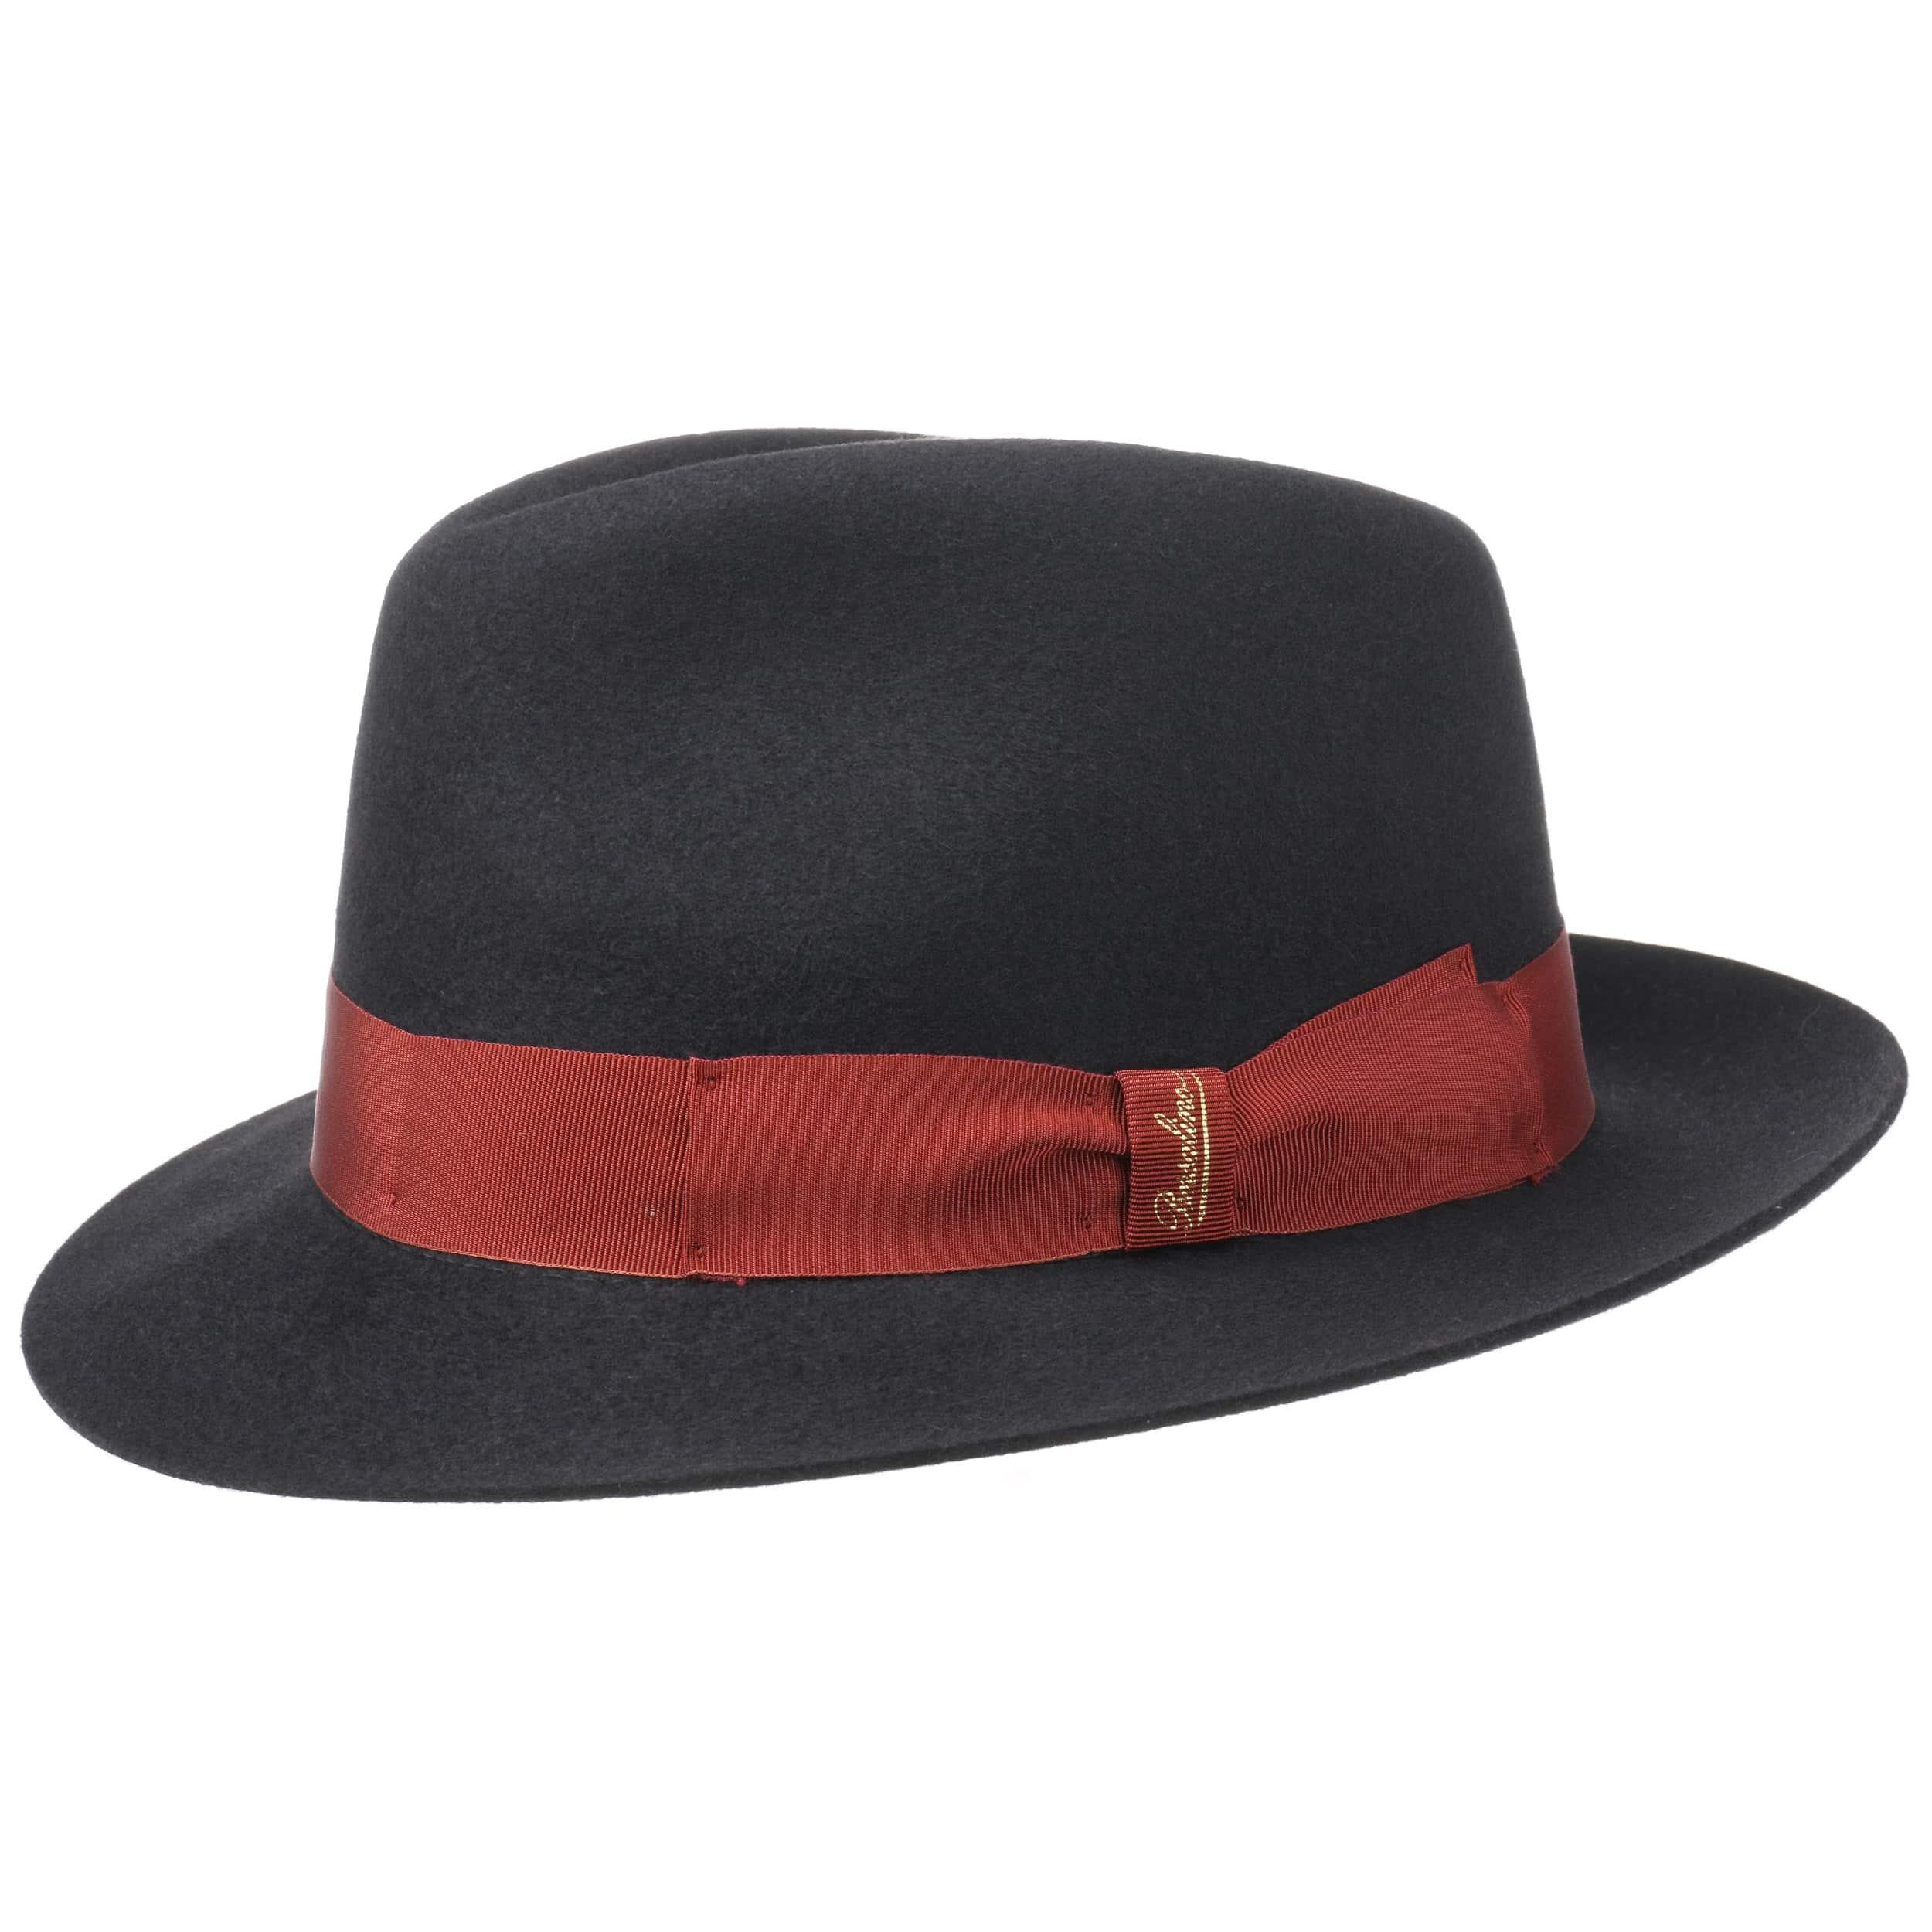 ... Finissimo Twotone Fedora Hat by Borsalino - black-red 5 ... c26859642ec